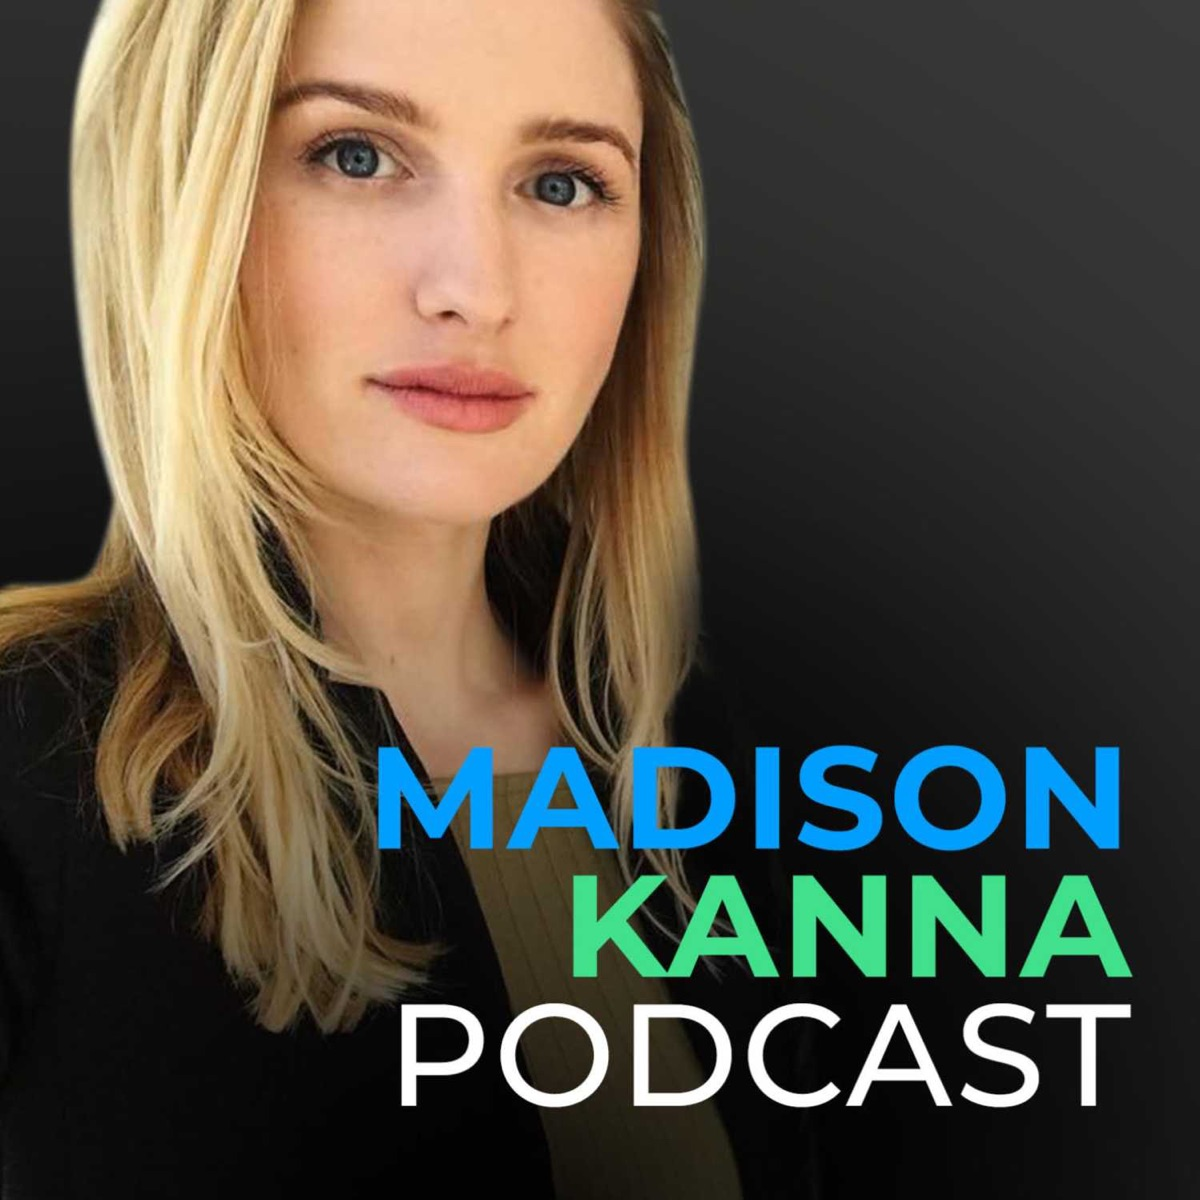 Madison Kanna Podcast